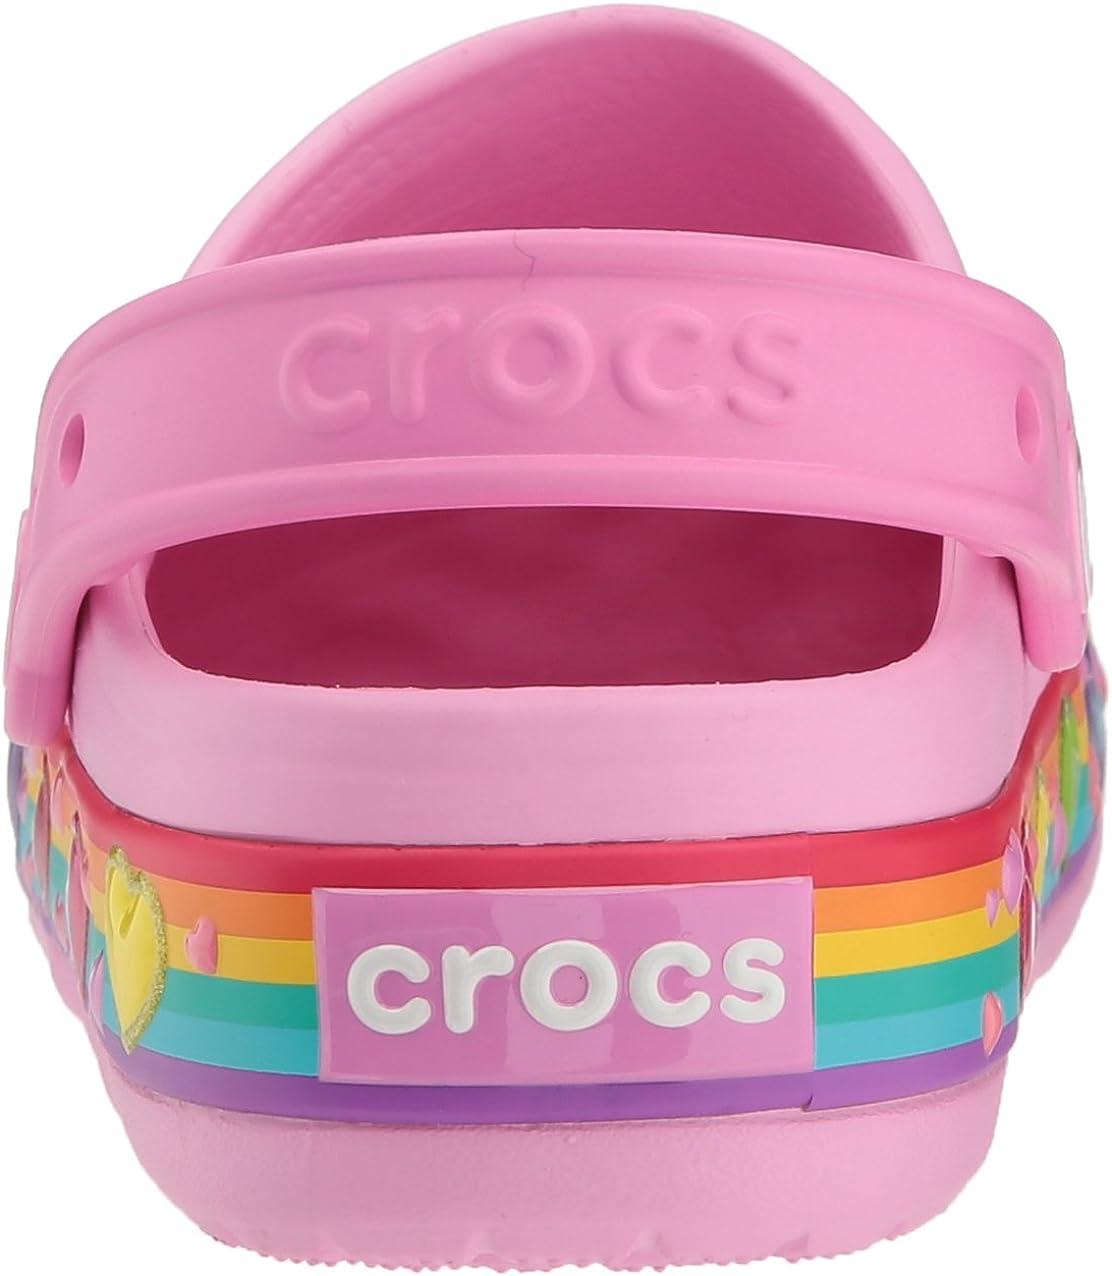 Crocs Crocband Fun Lab Lights Clog Kids Sabots Mixte Enfant